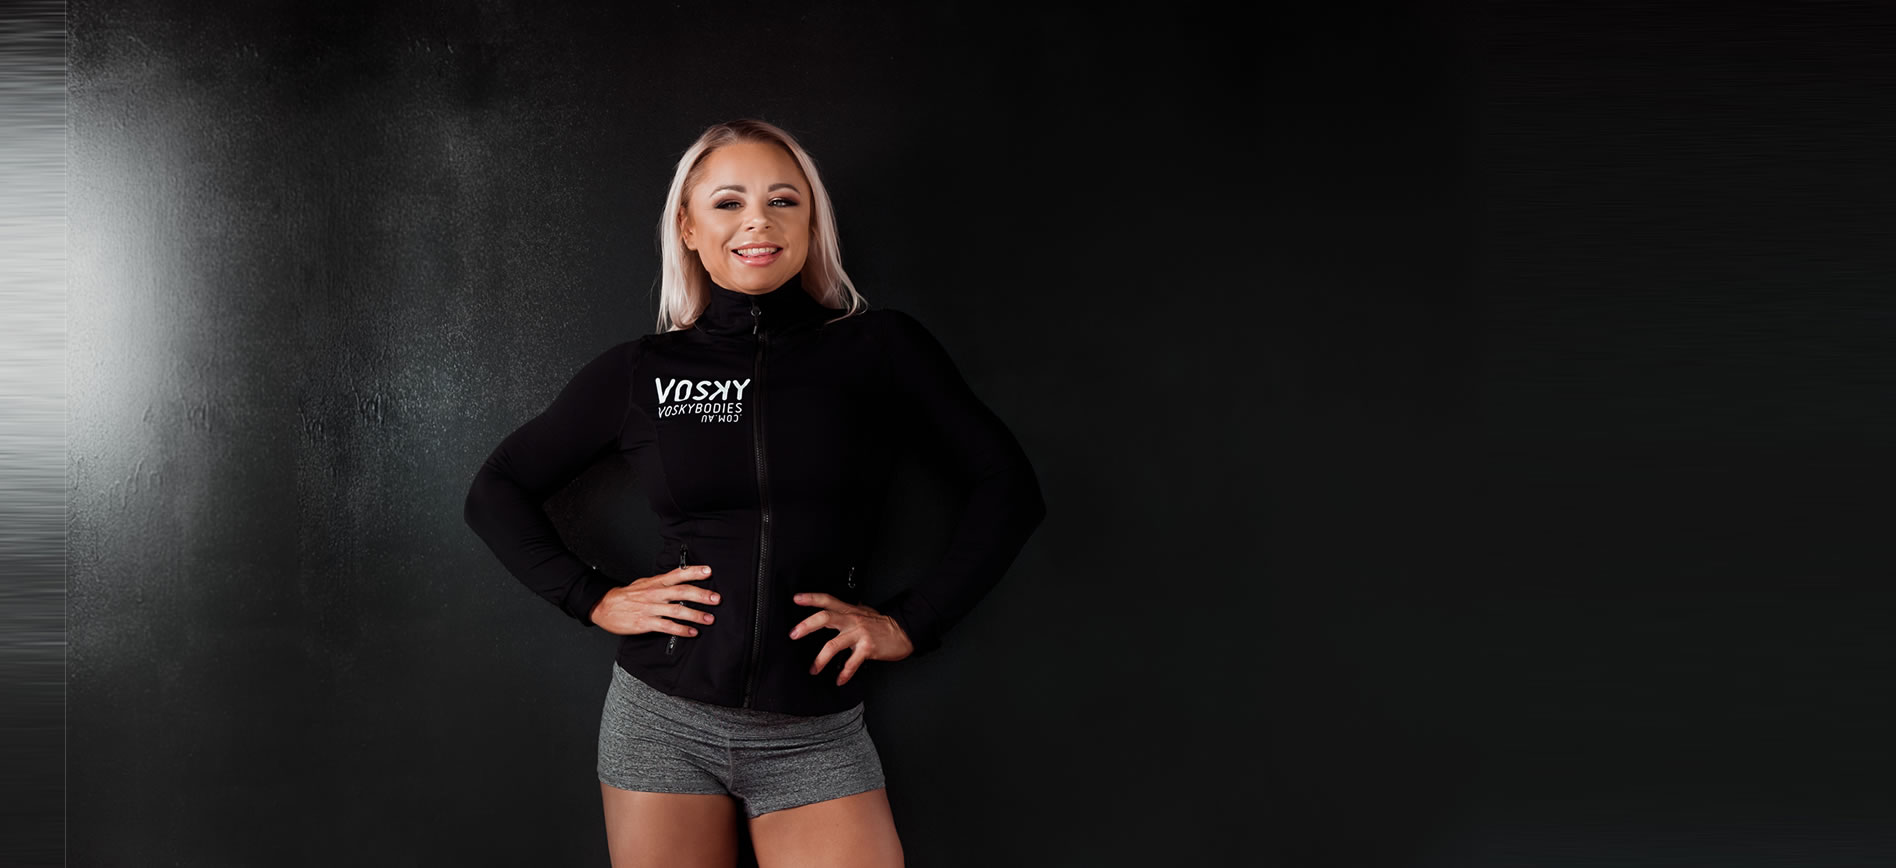 zoe-claire yaworsky ifbb pro figure australia coach bodybuilding